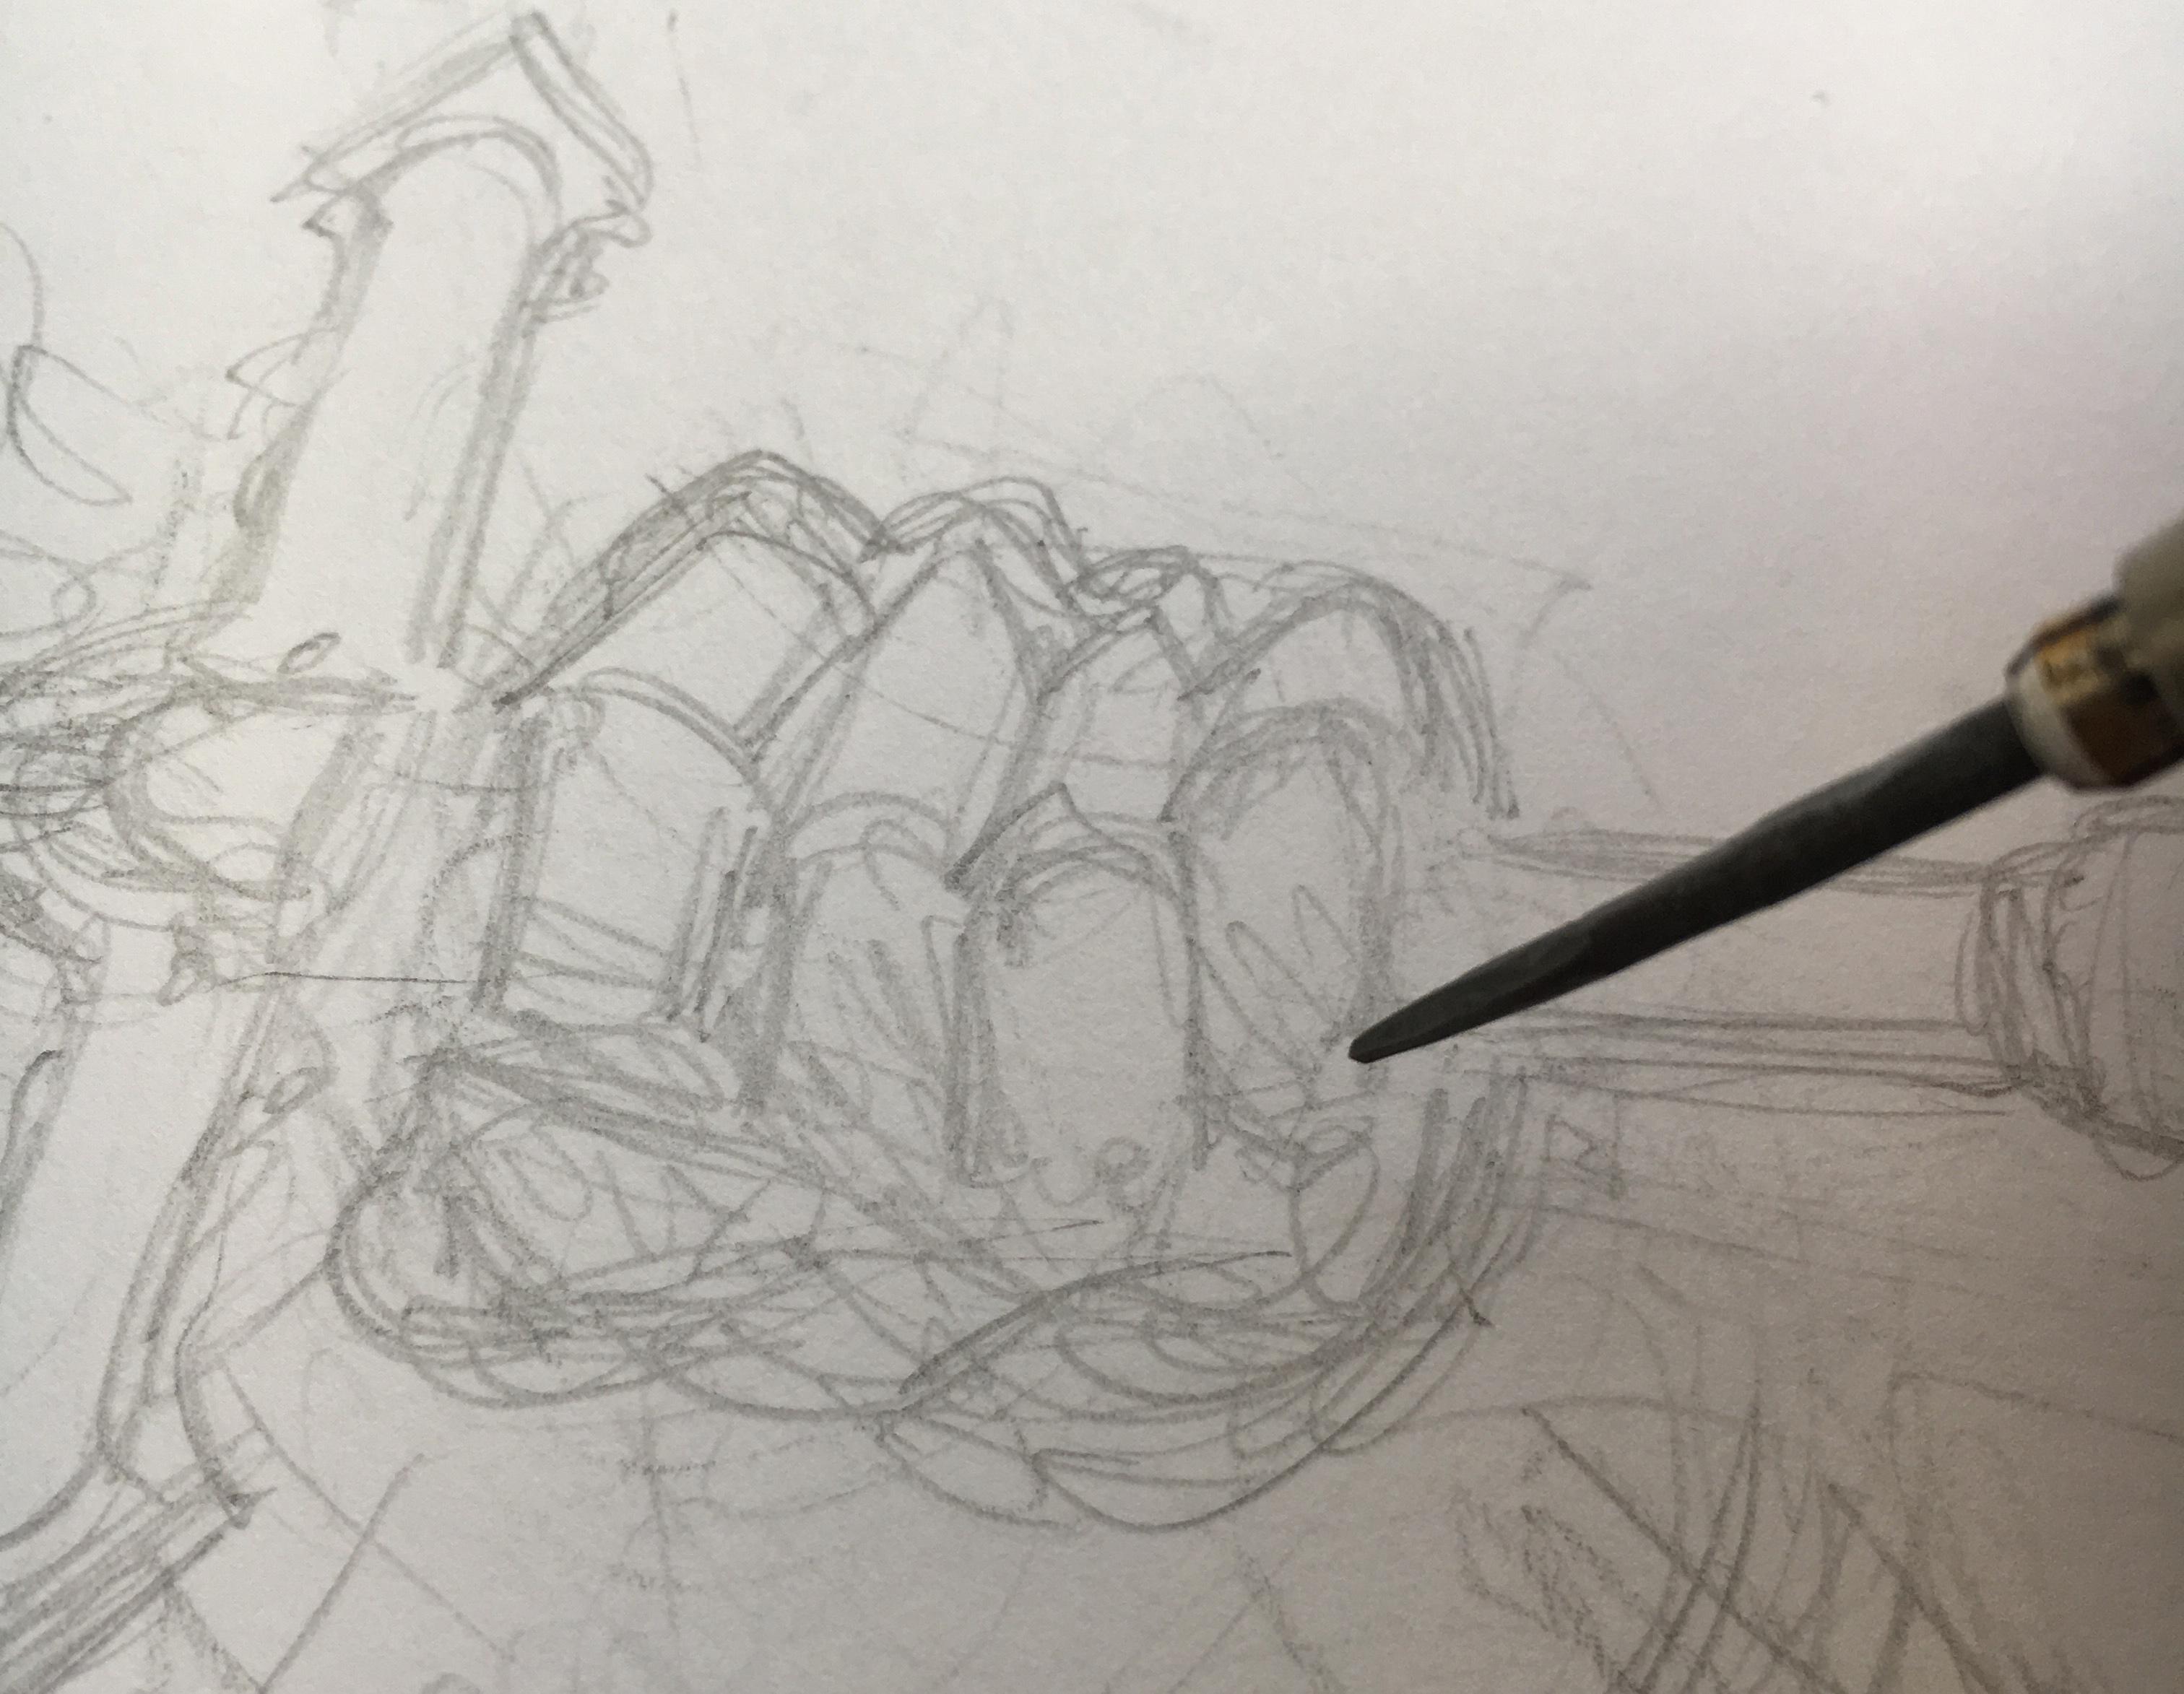 Pencil sketch of body armour